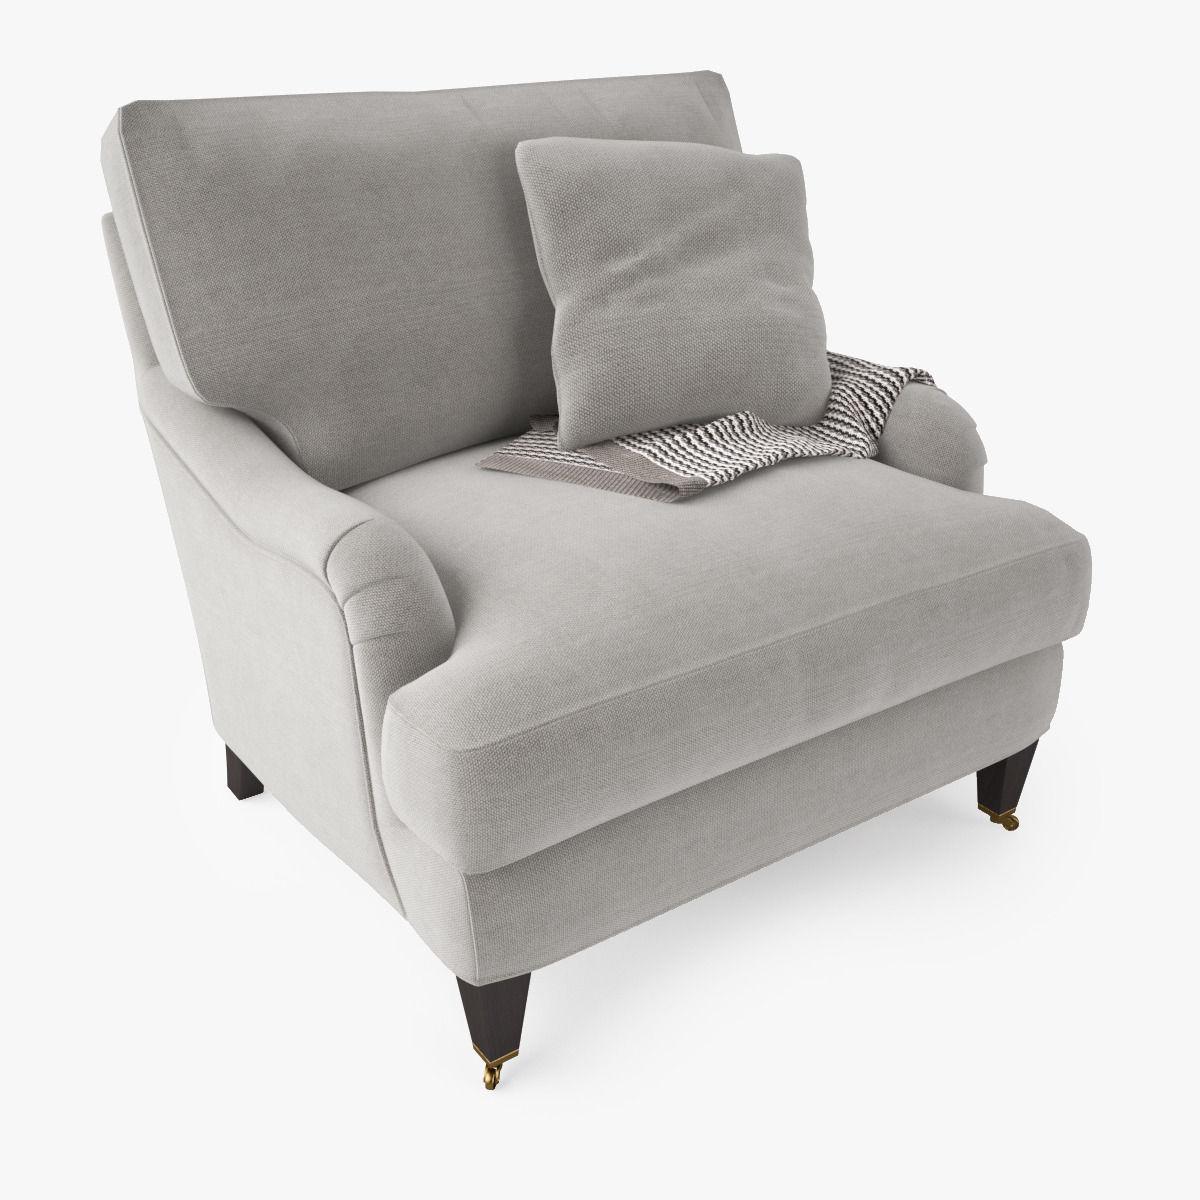 ... Crate And Barrel Essex Chair With Casters 3d Model Max Obj Fbx Mtl 5 ...